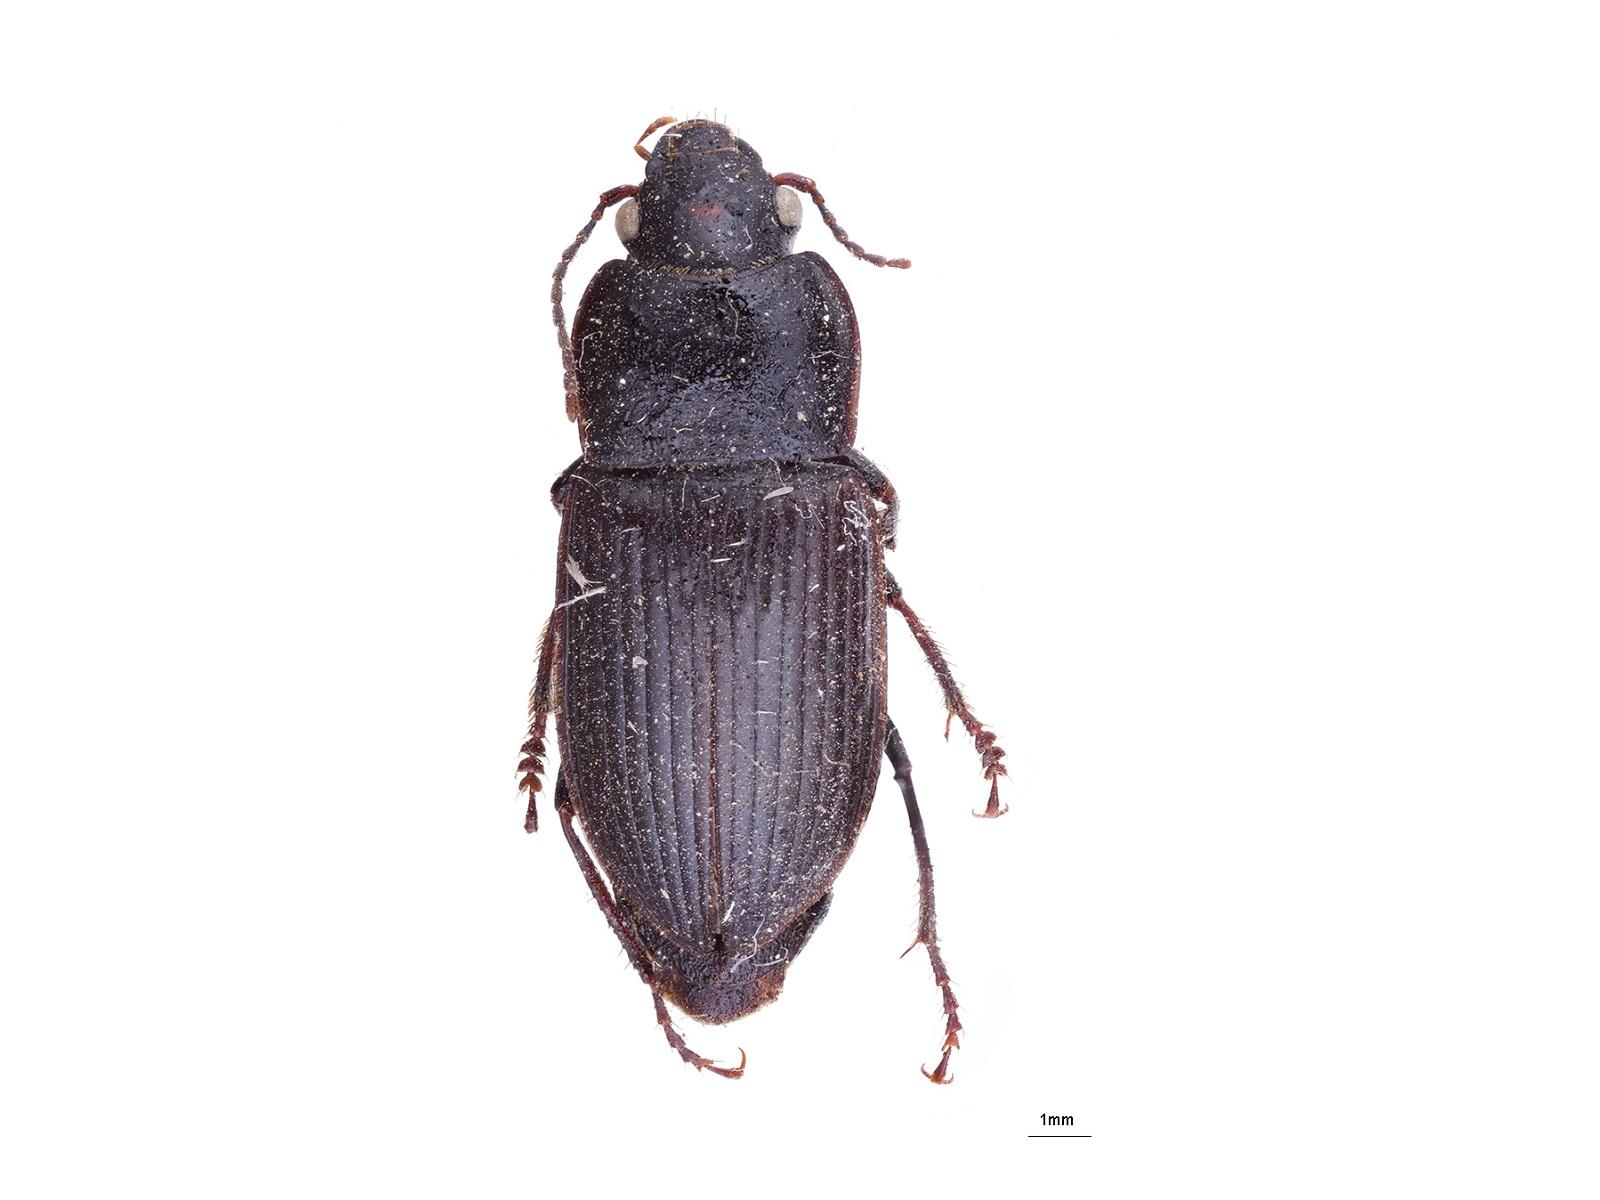 Anisodactylus signatus (Panzer, 1796)